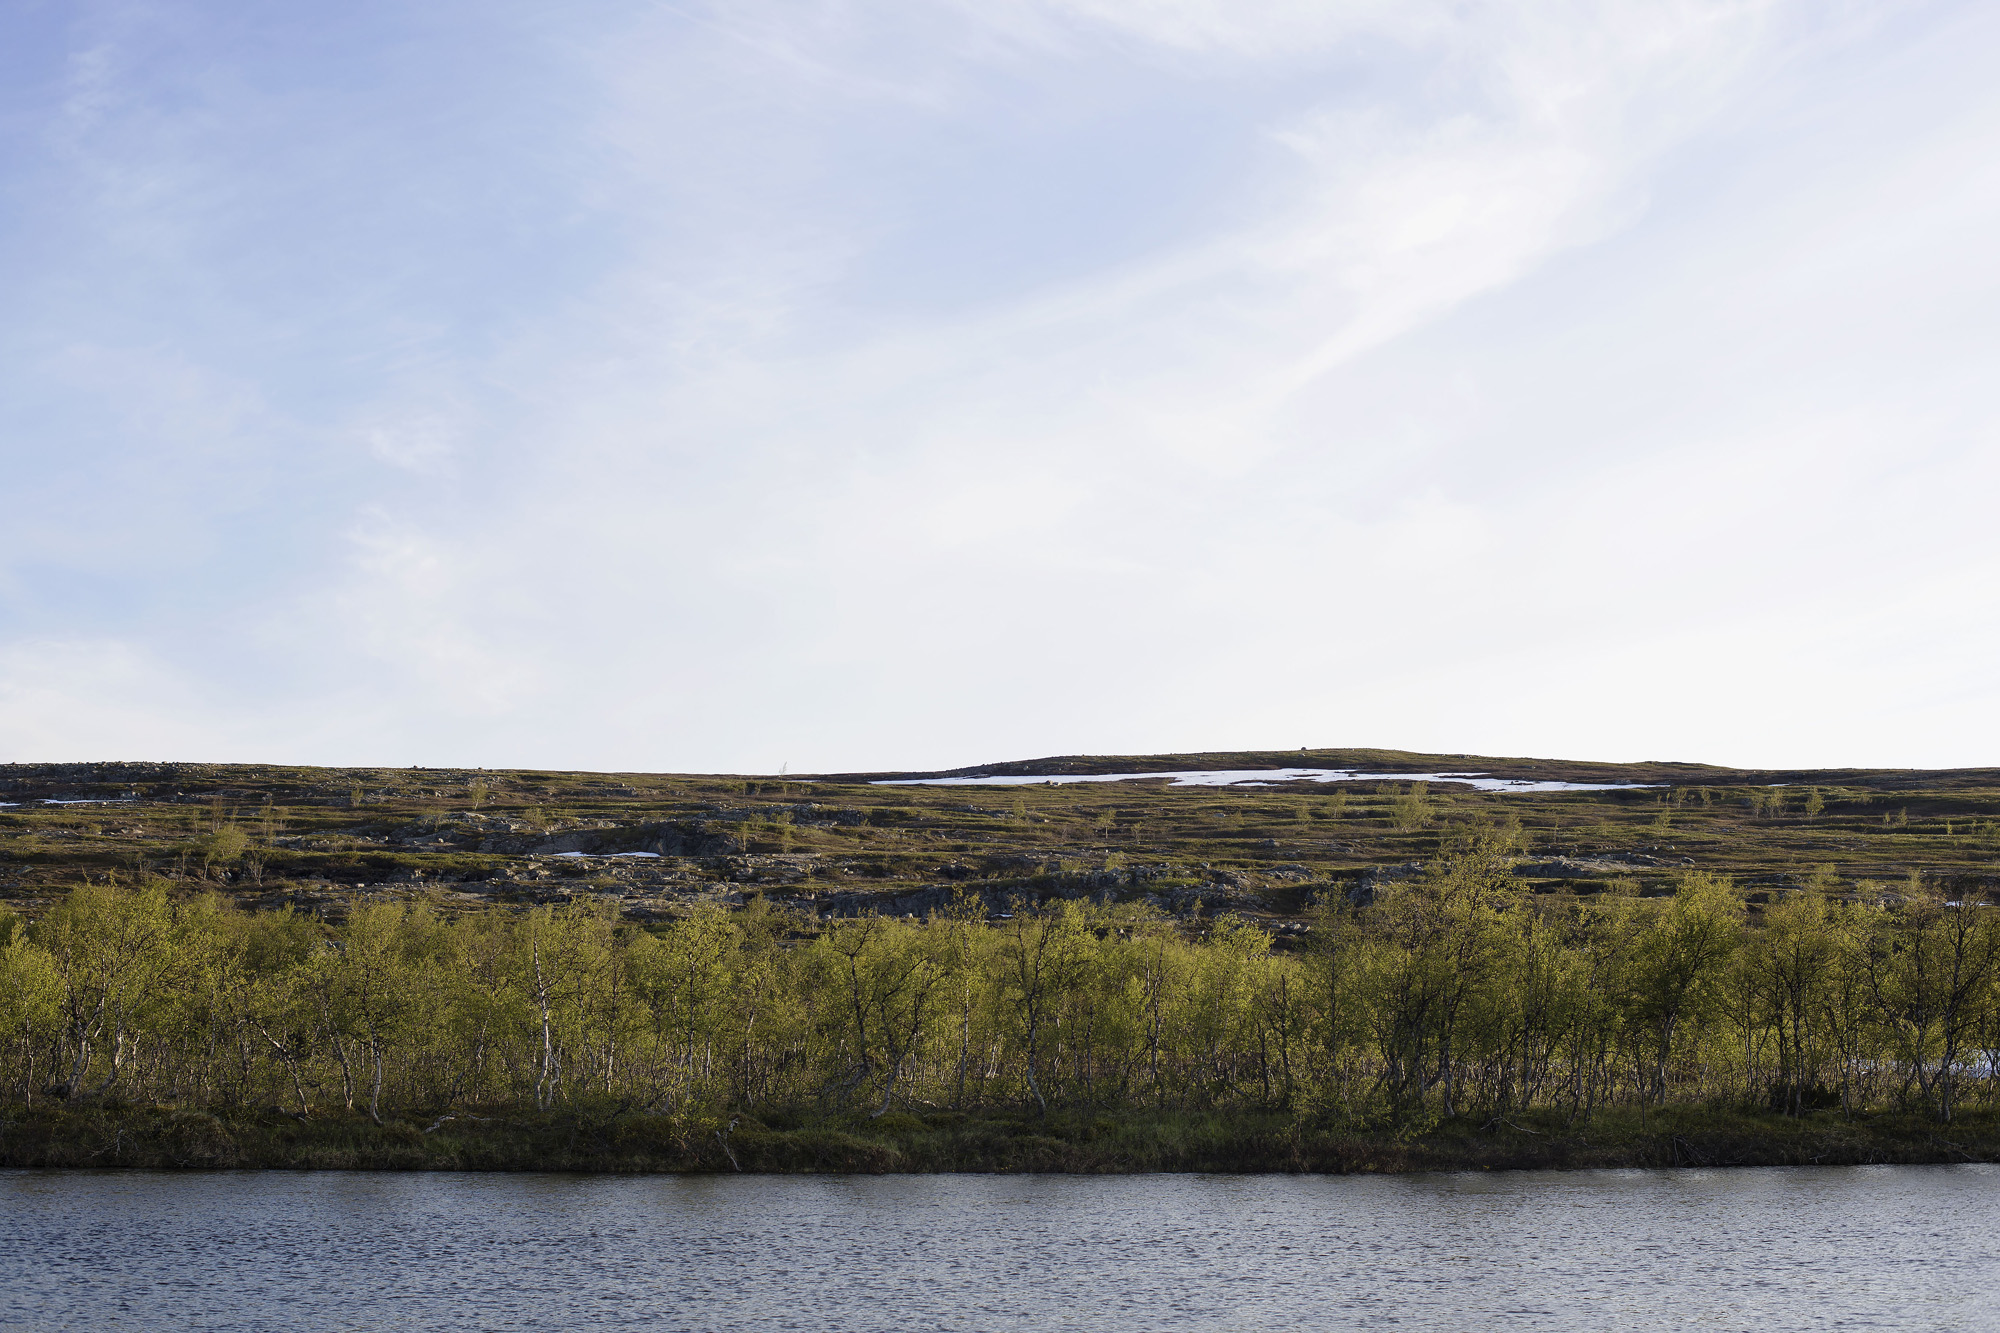 Horisontale linjer. Foto: Åsmund Indrebø Næs